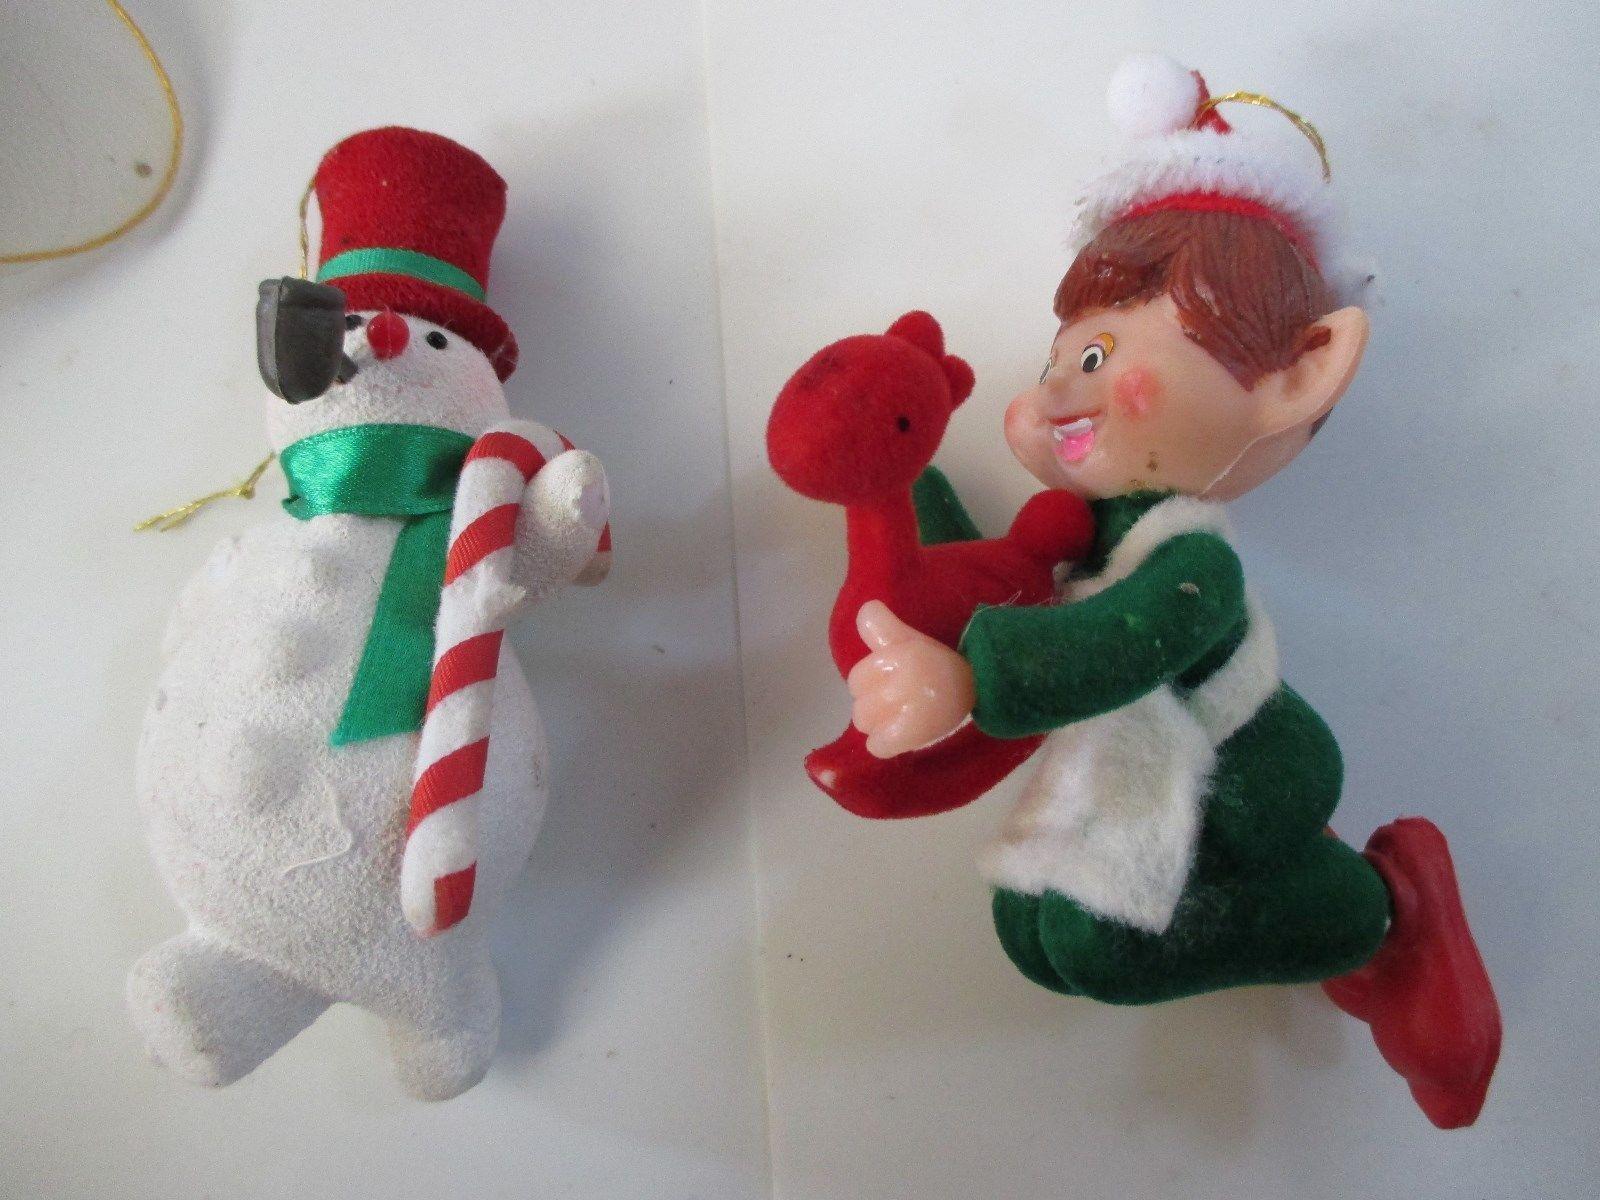 Vintage Rubber Face Shelf Elf Angel Napco Mistletoe Knee Hugger